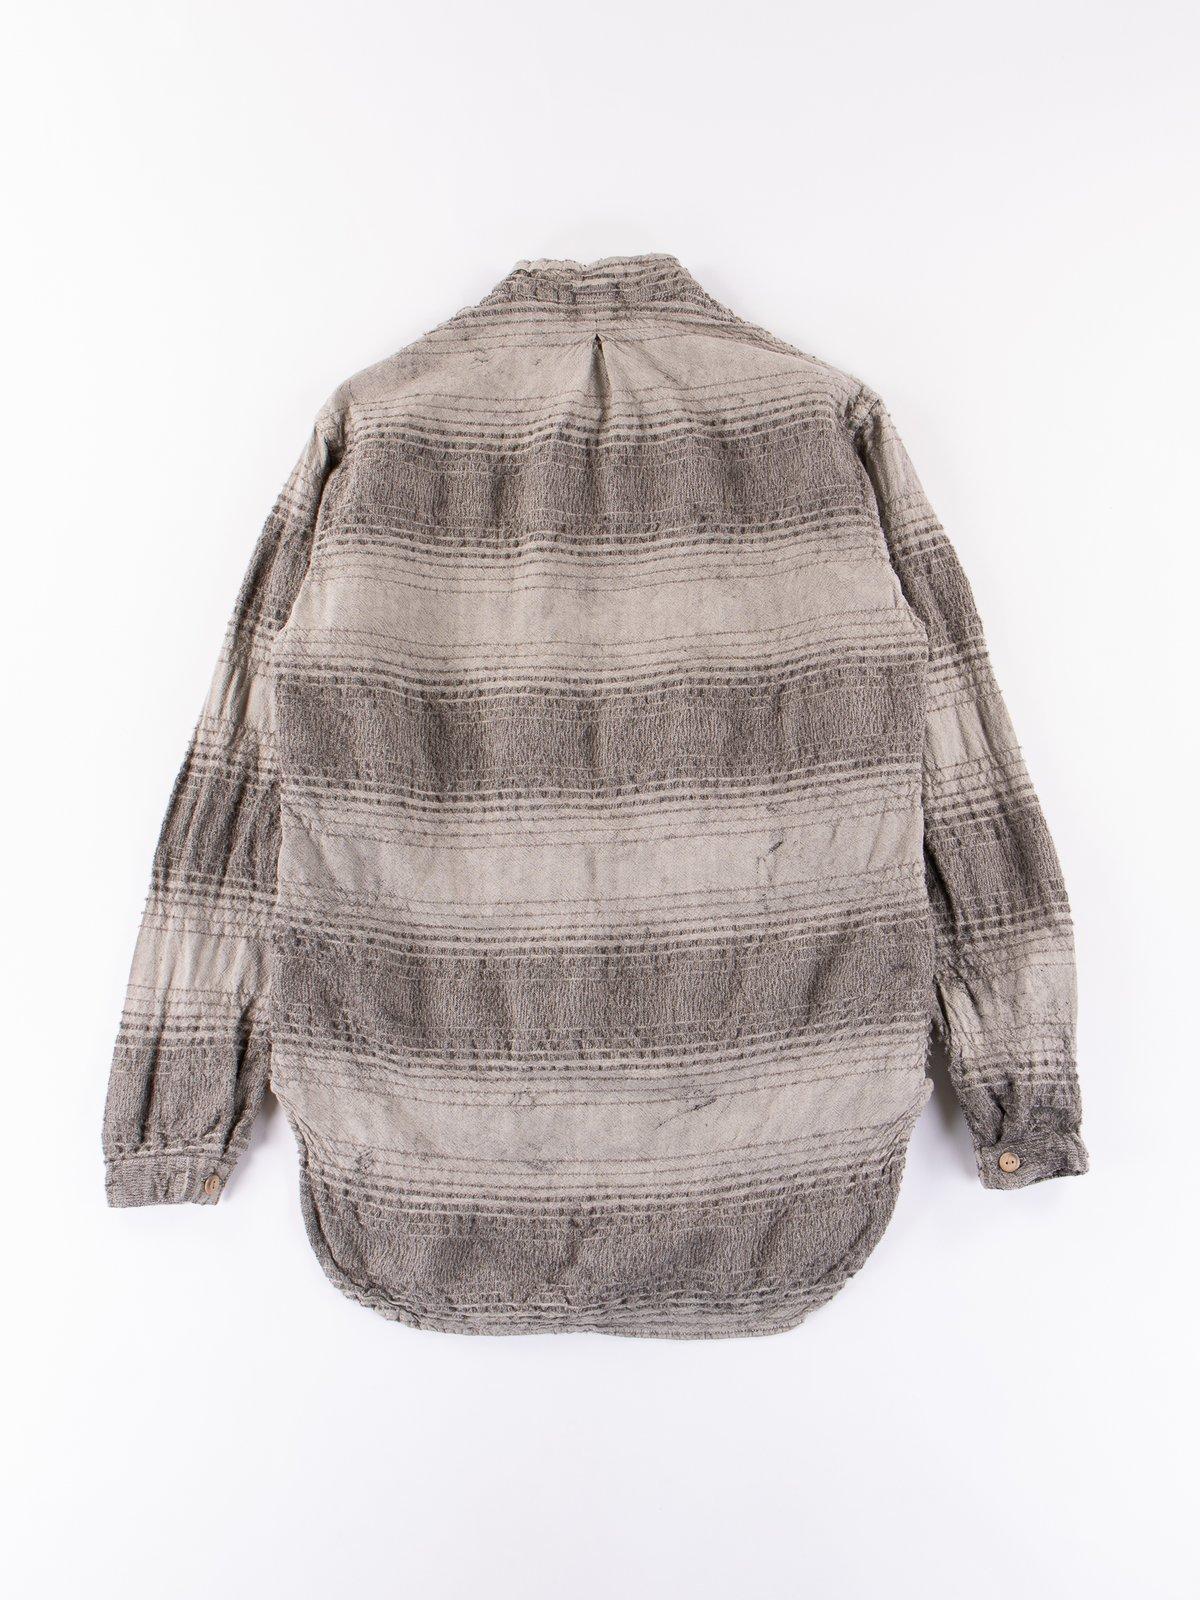 Indian Black Dye Doppler Stripe Calico Periscope Pocket Tail Shirt - Image 6